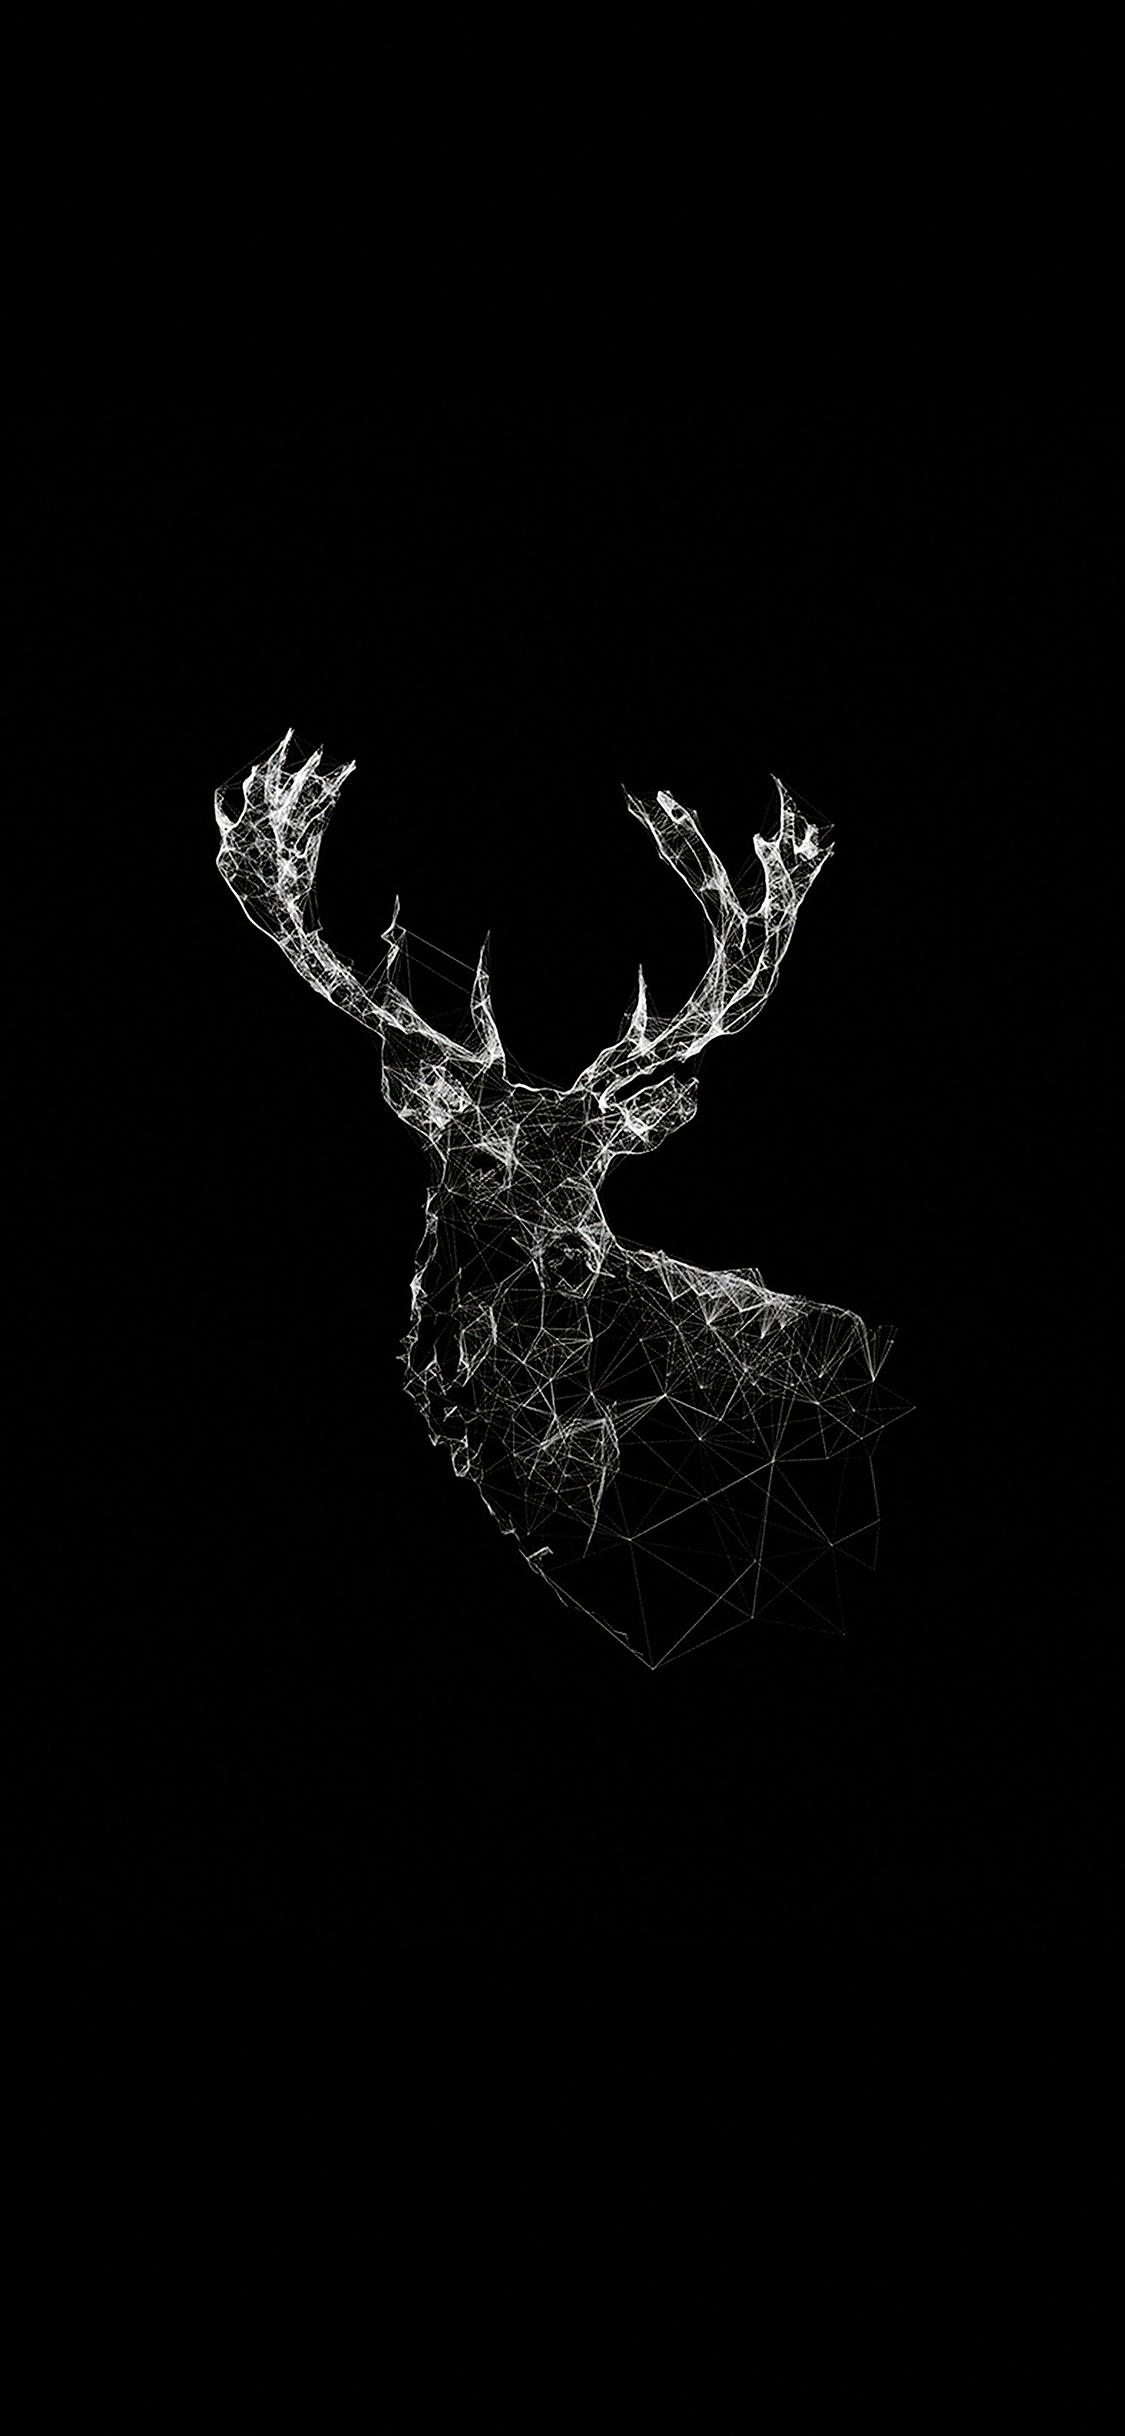 Disney Wallpaper For Iphone 5 Ad29 Deer Animal Illust Dark Papers Co